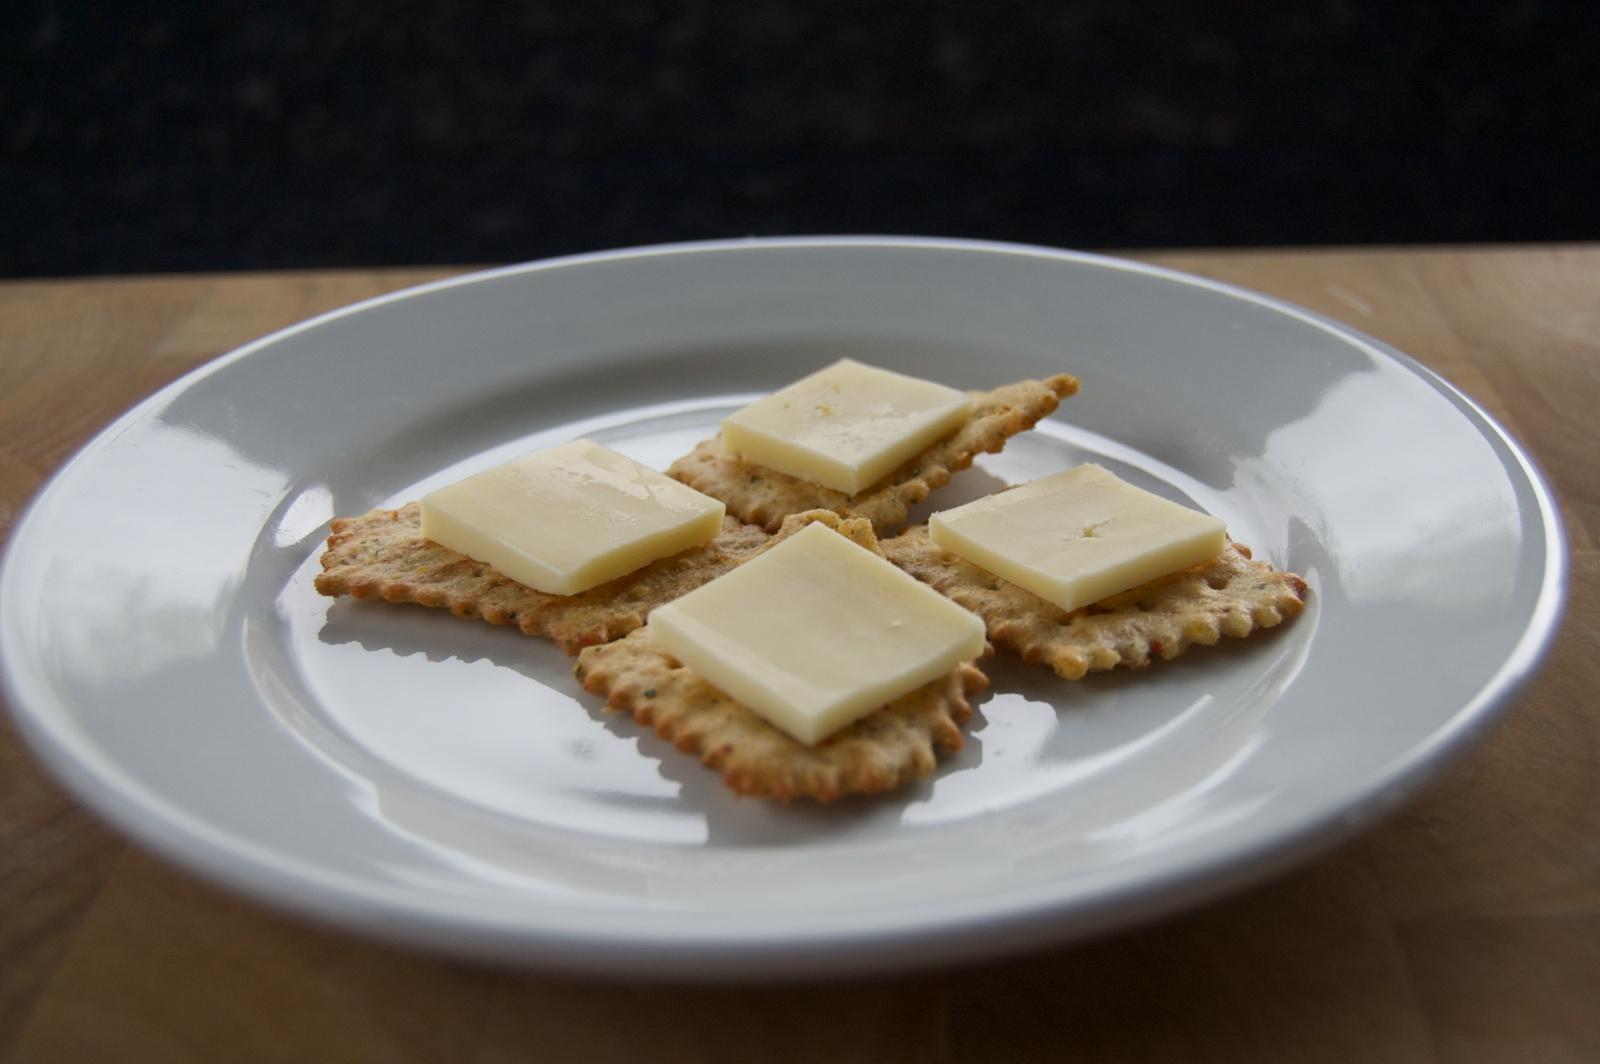 http://blog.rickk.com/food/2012/05/08/ate.2012.05.08.s.jpg